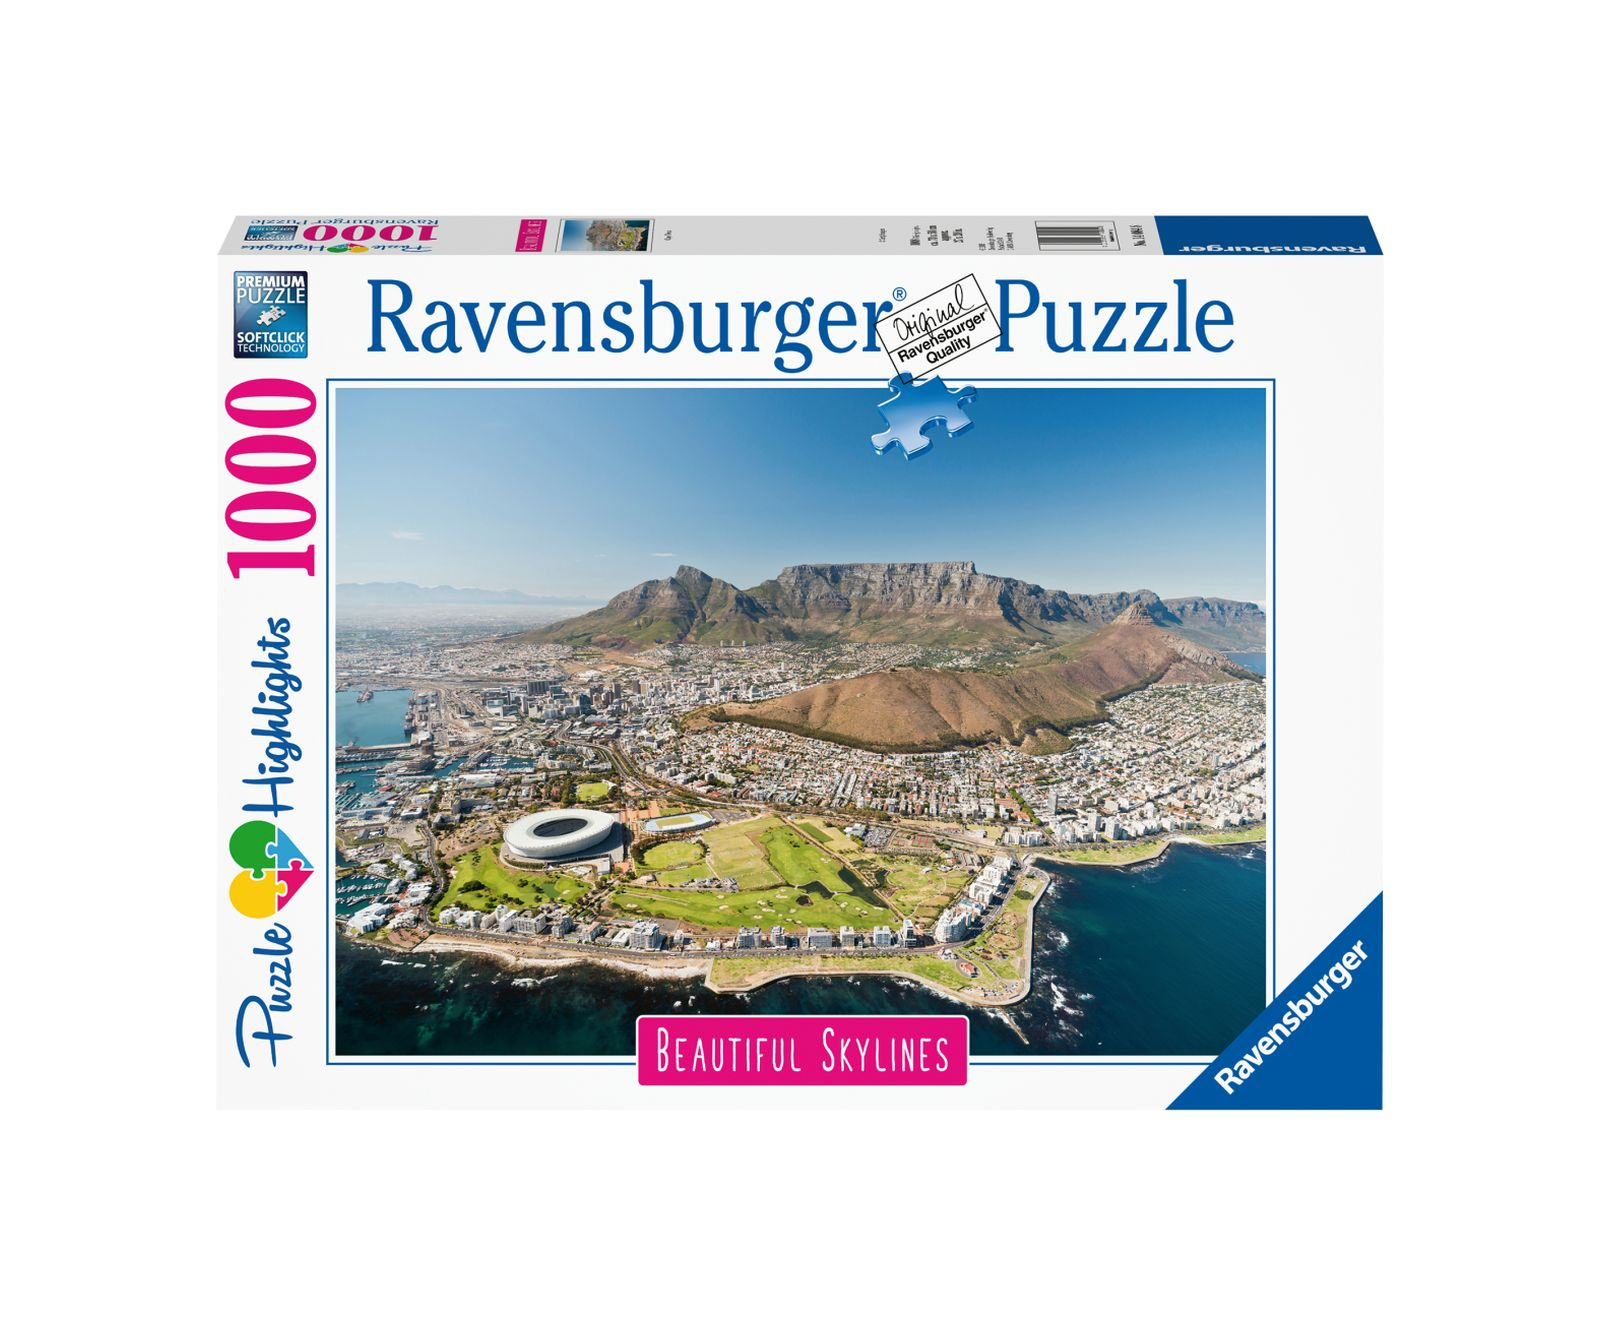 Ravensburger puzzle 1000 pezzi cape town - Ravensburger1